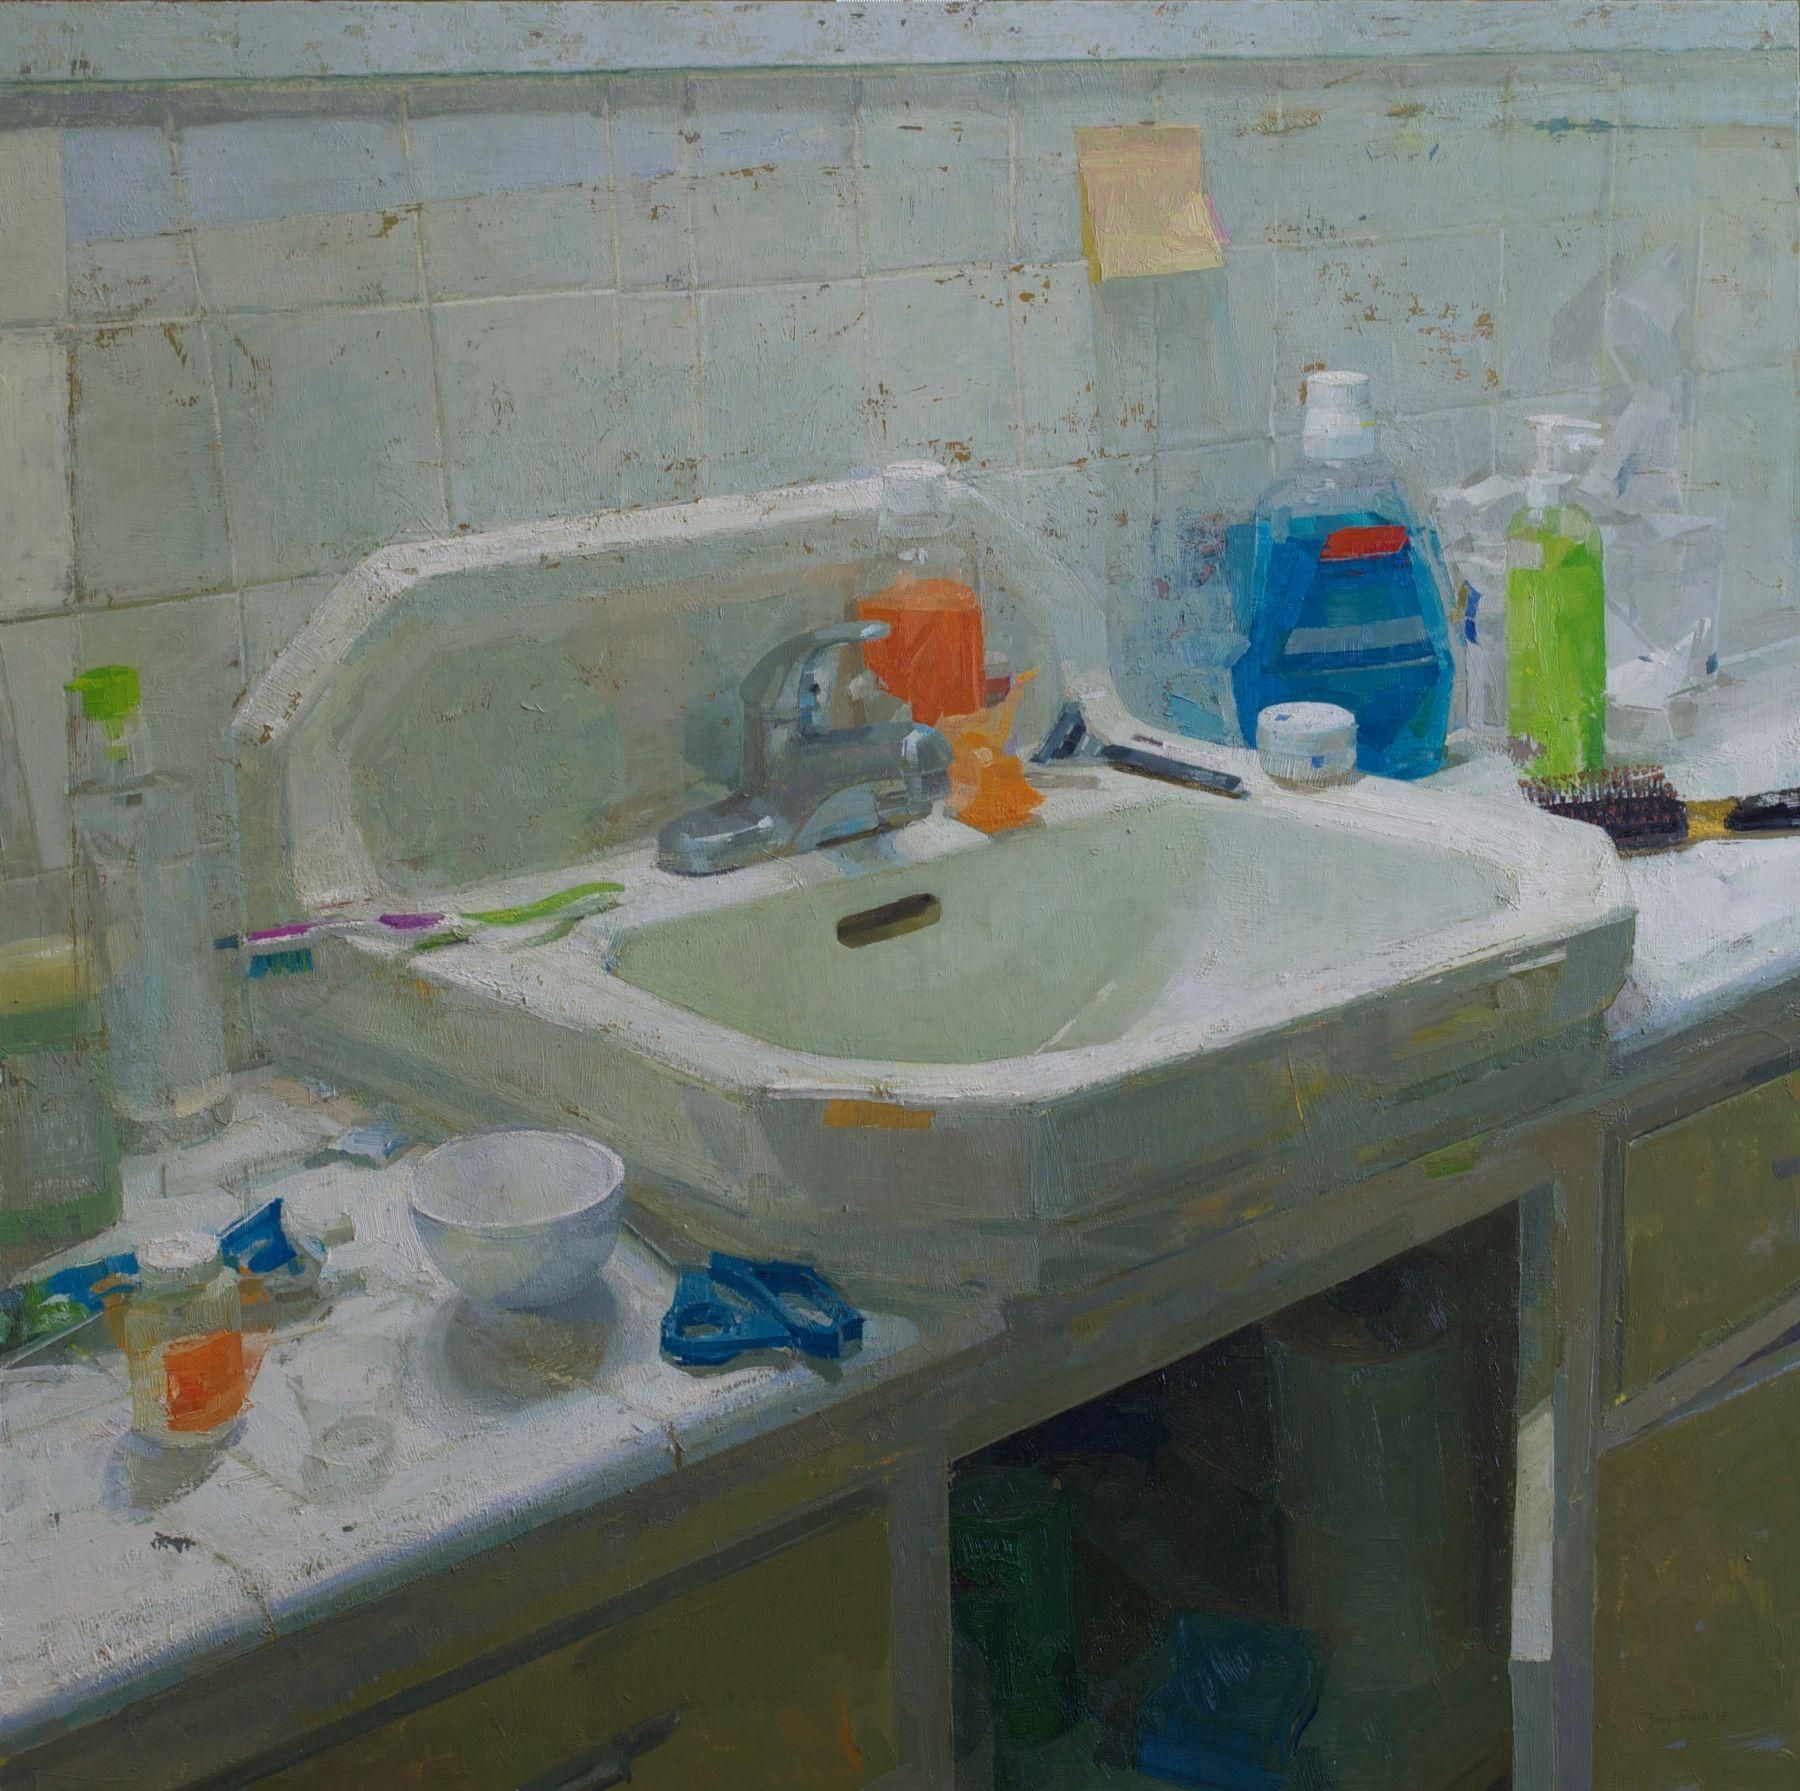 Zoey Frank, Bathroom Sink, 2017